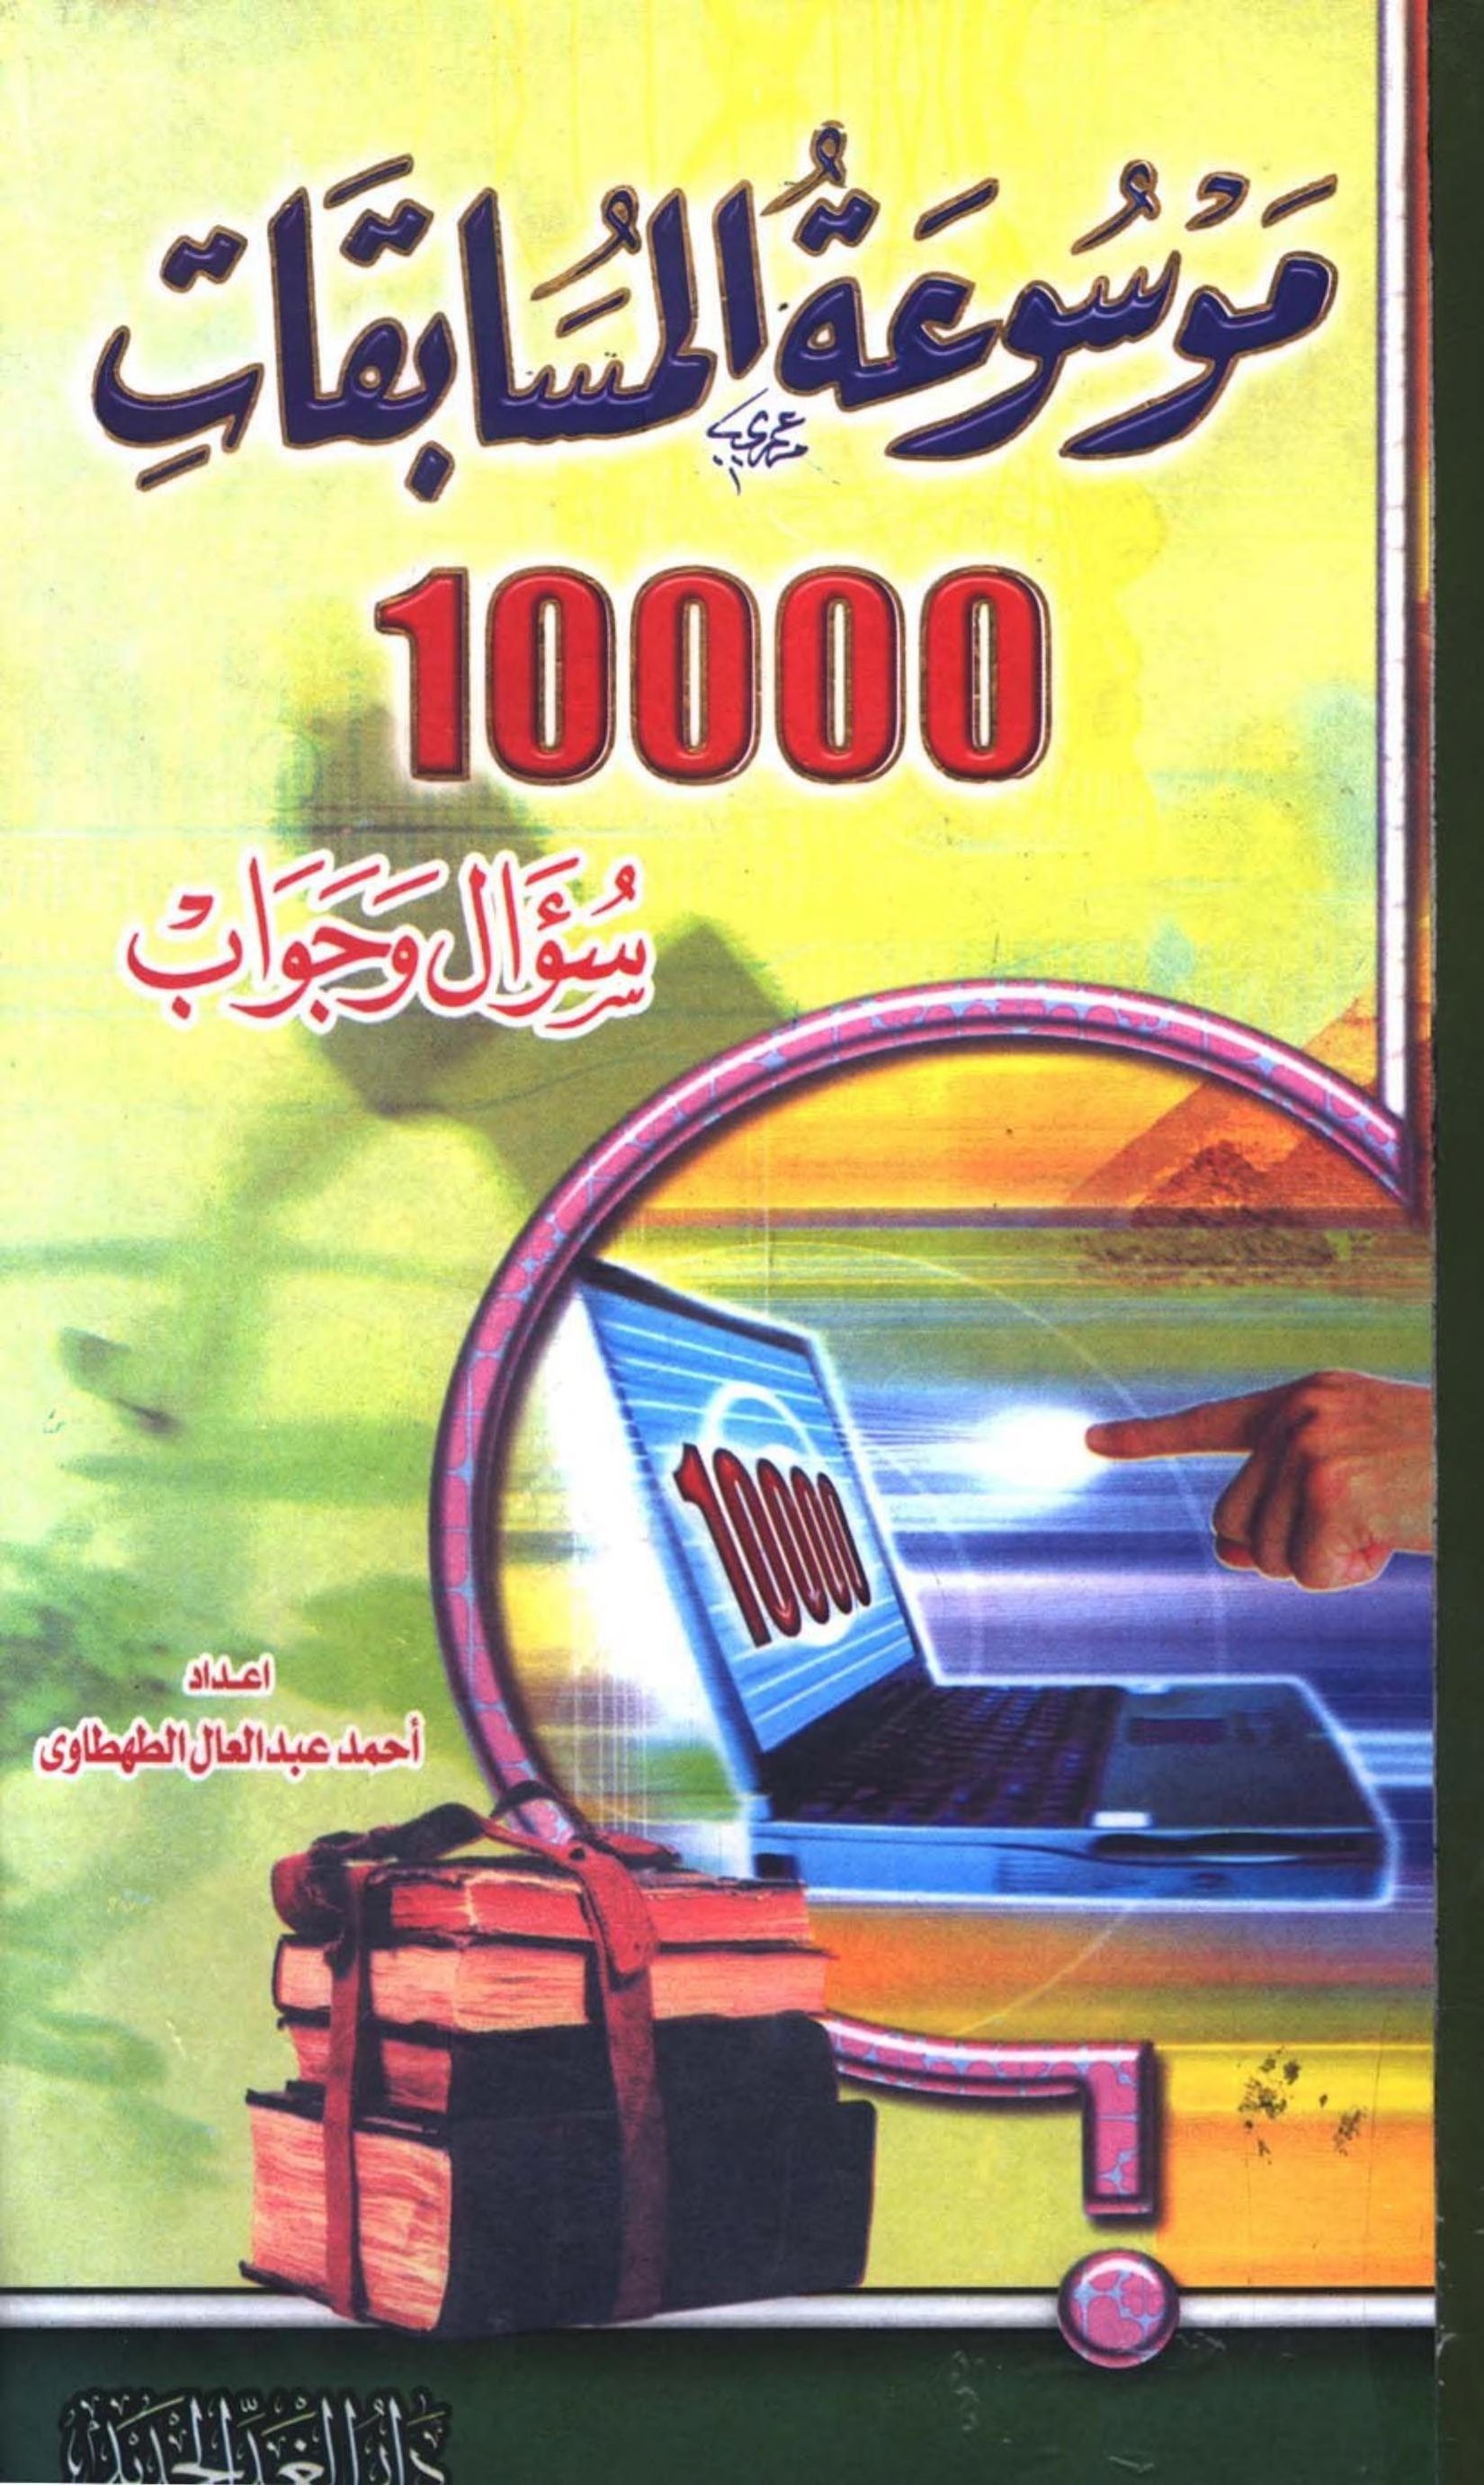 موسوعة المسابقات عشرة آلاف سؤال وجواب Free Download Borrow And Streaming Internet Archive Internet Archive Books Free Download Pdf Arabic Books